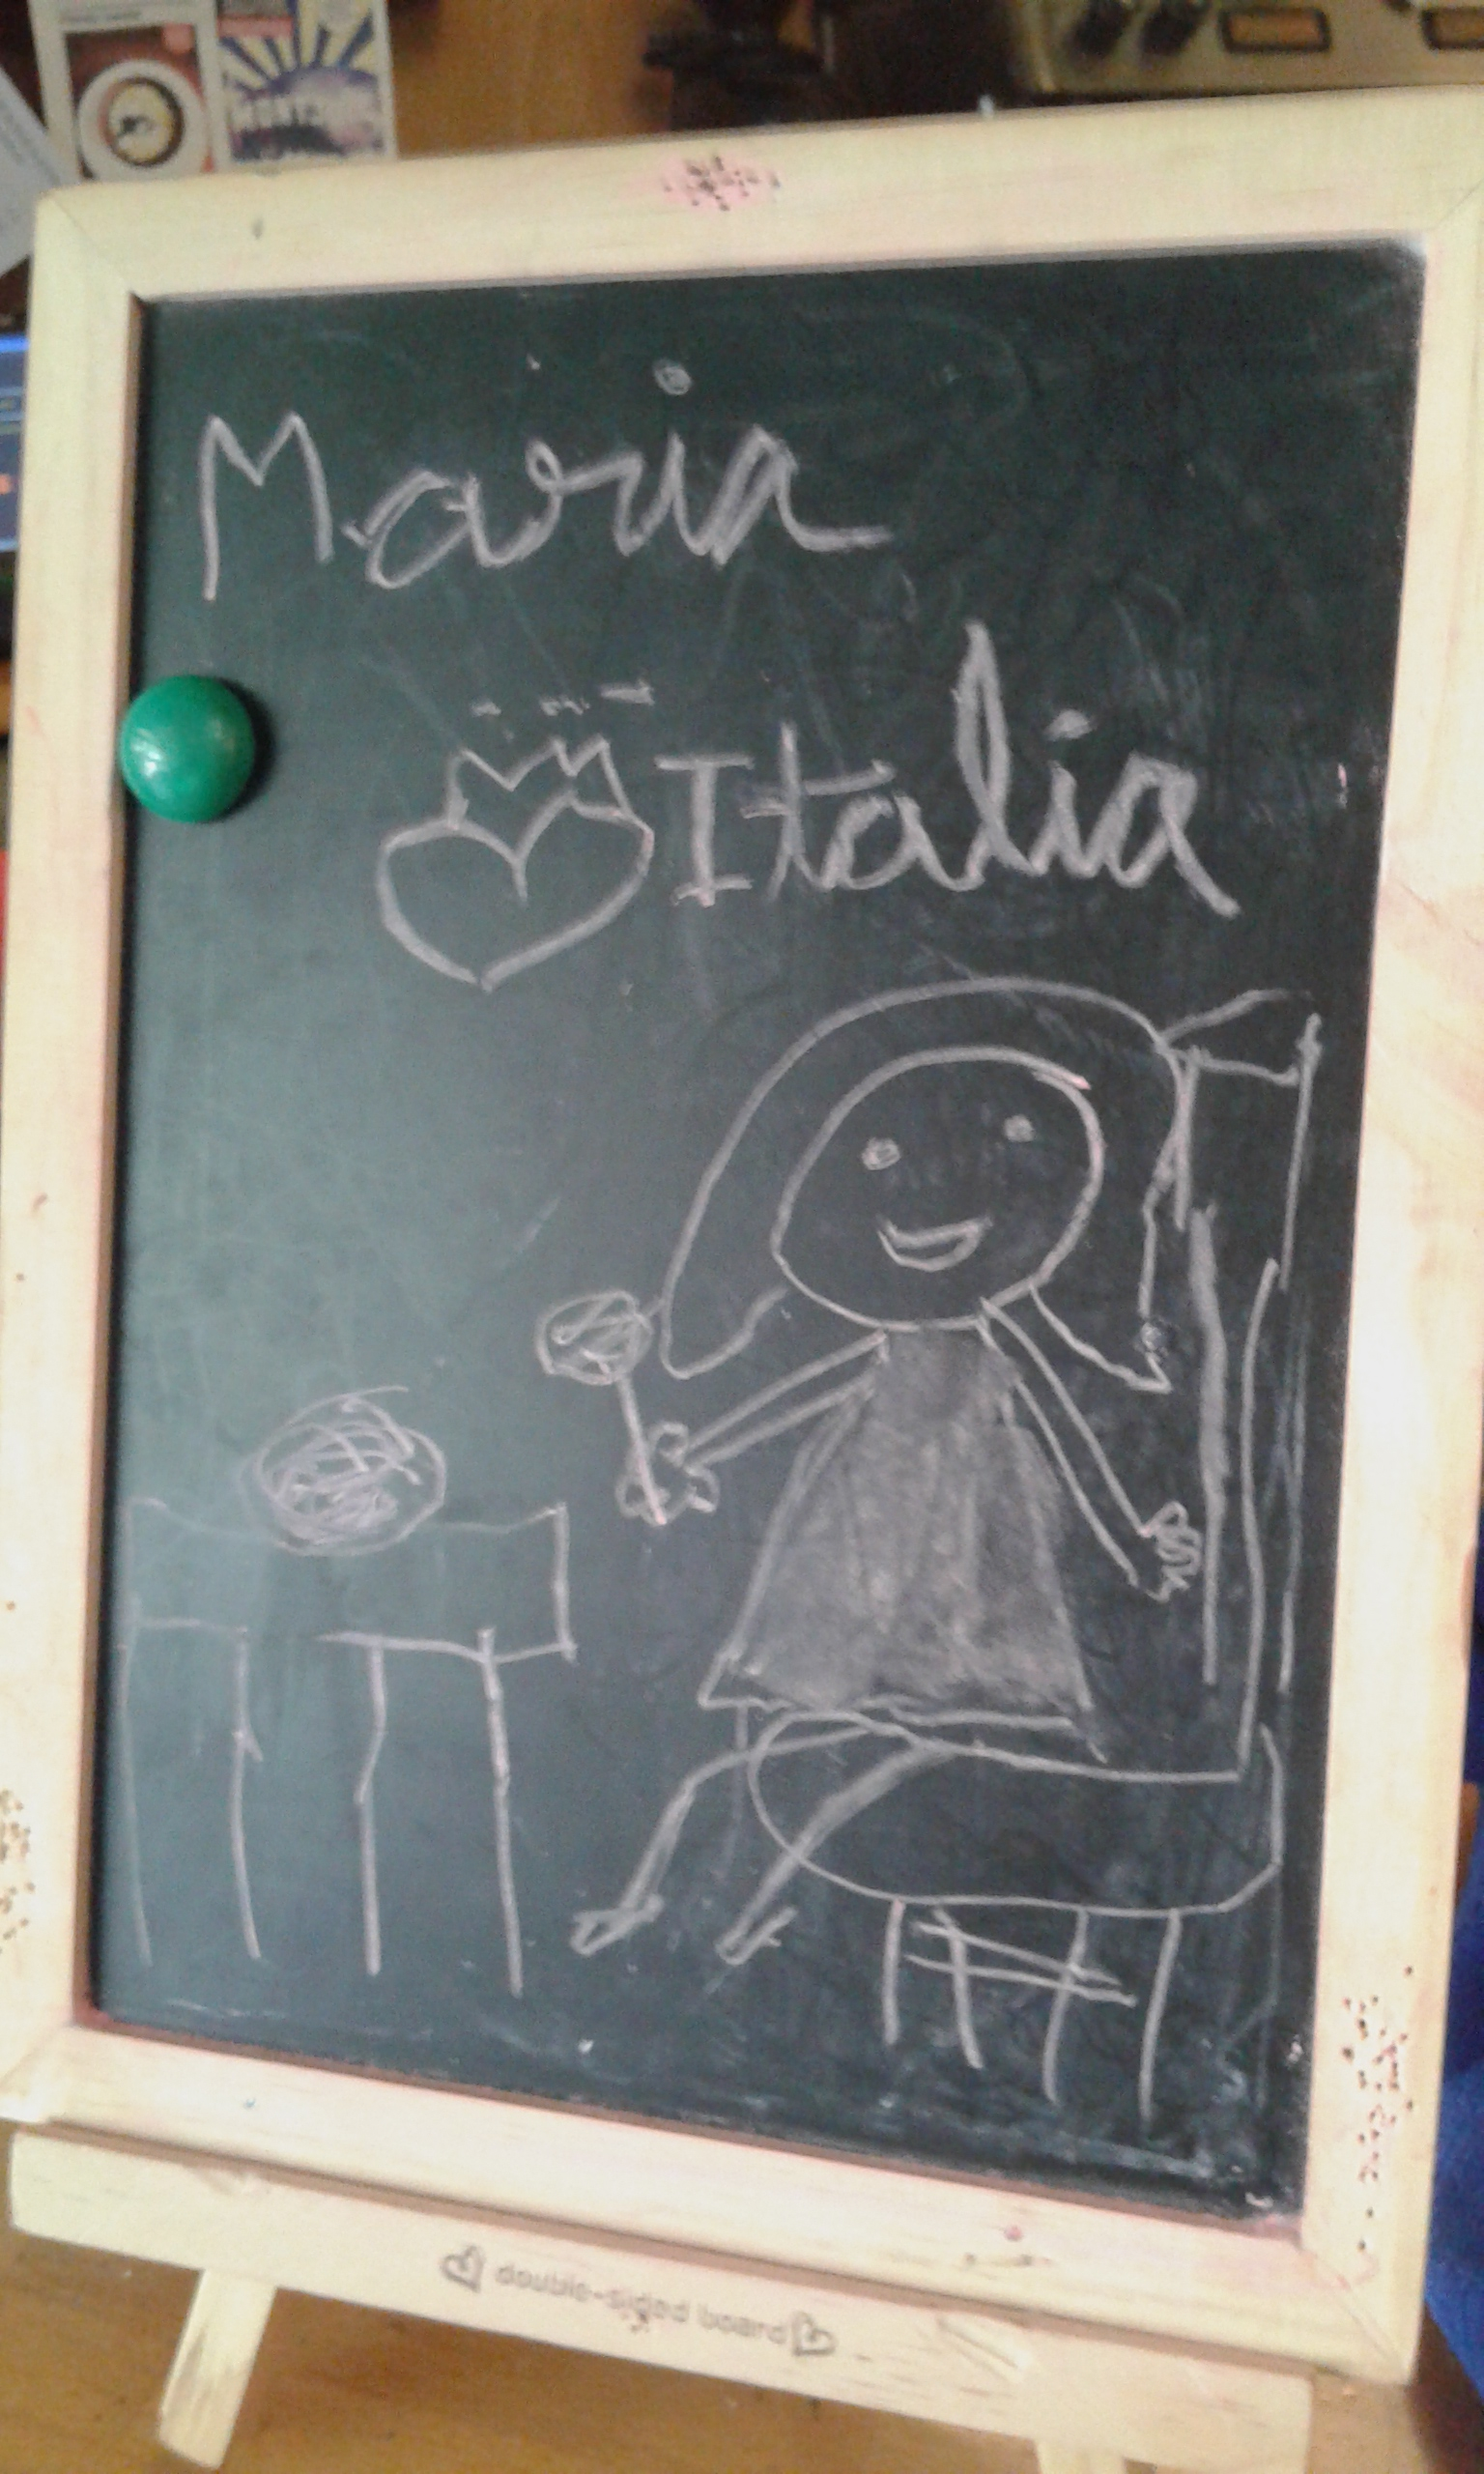 Maria loves Italia